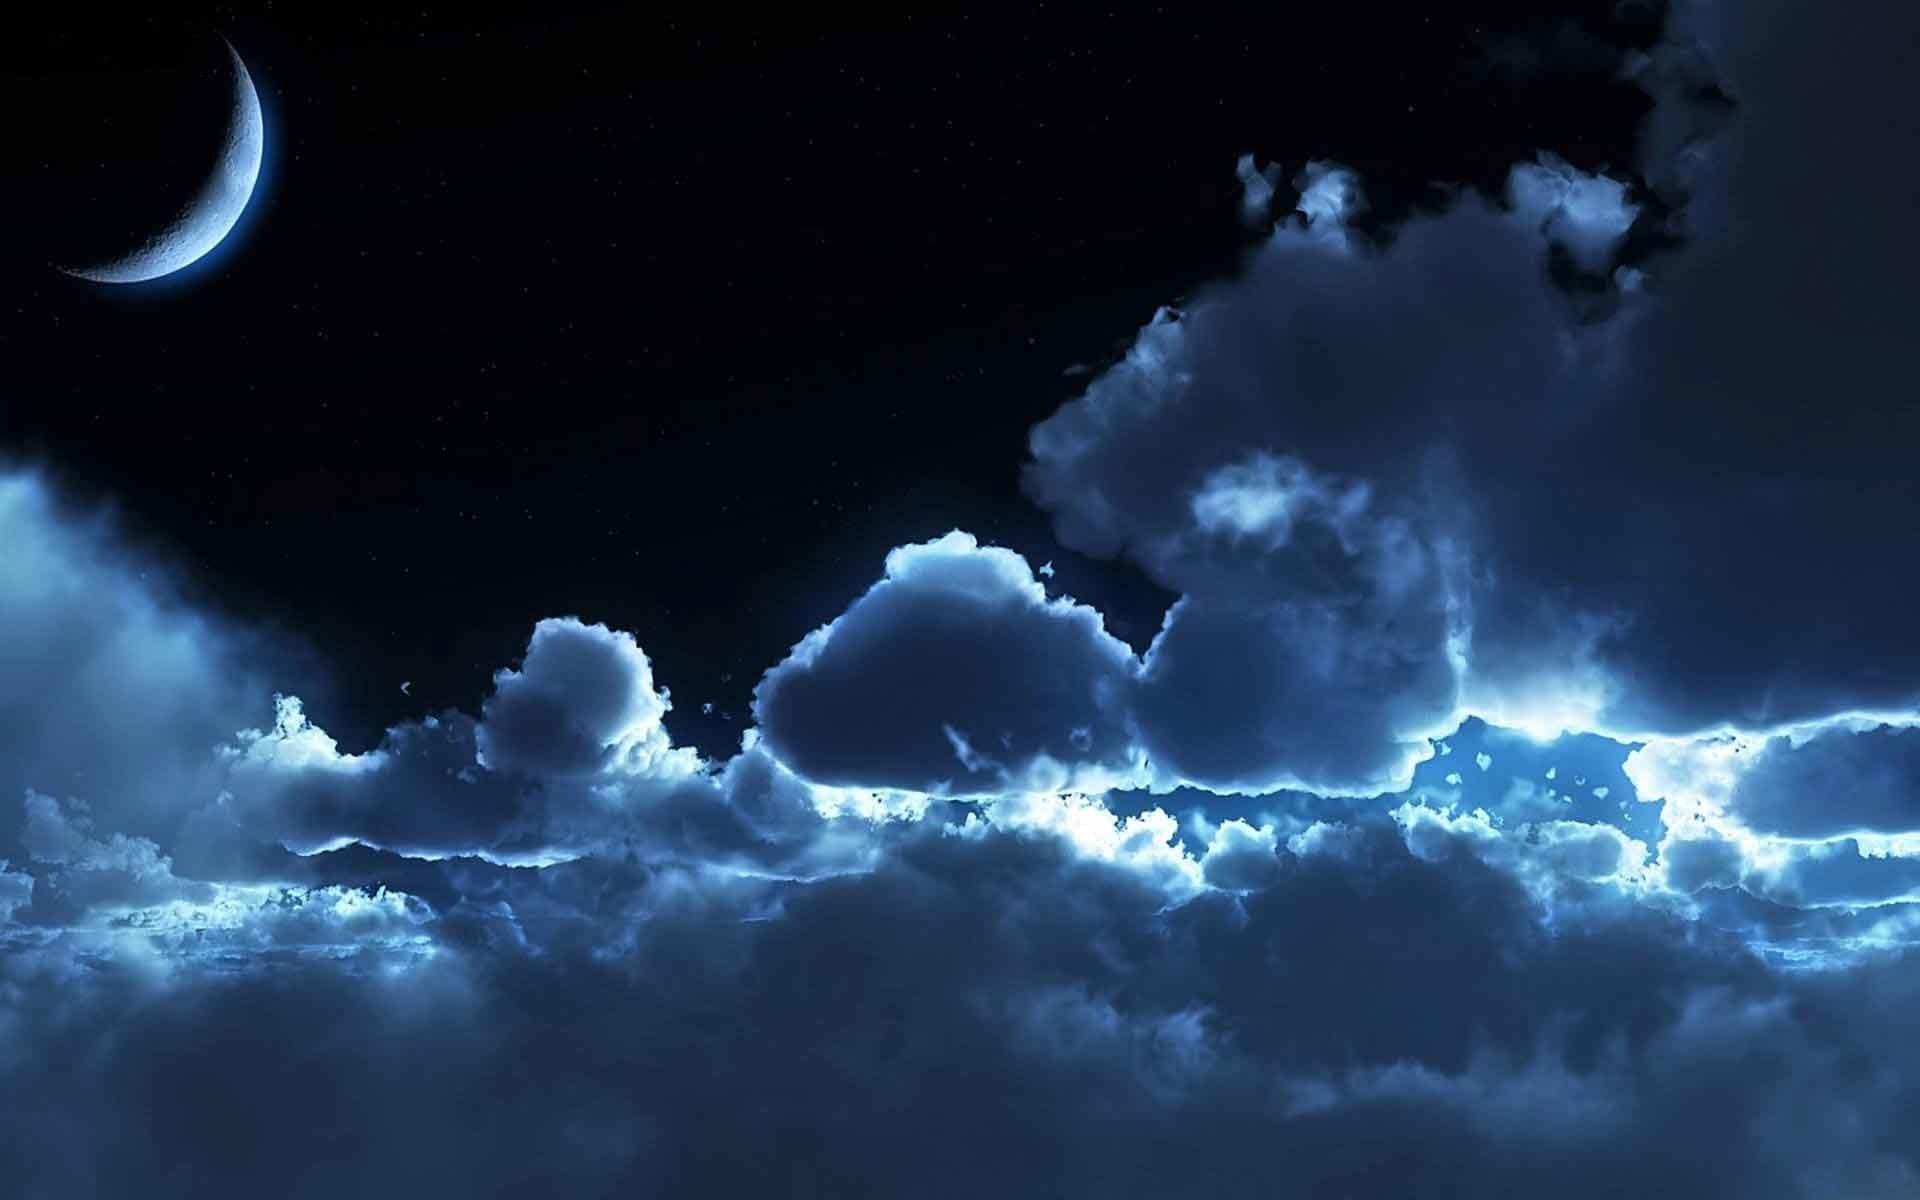 Sky Moonlight Fantasy Moon Cloud Nature Wallpaper Windows